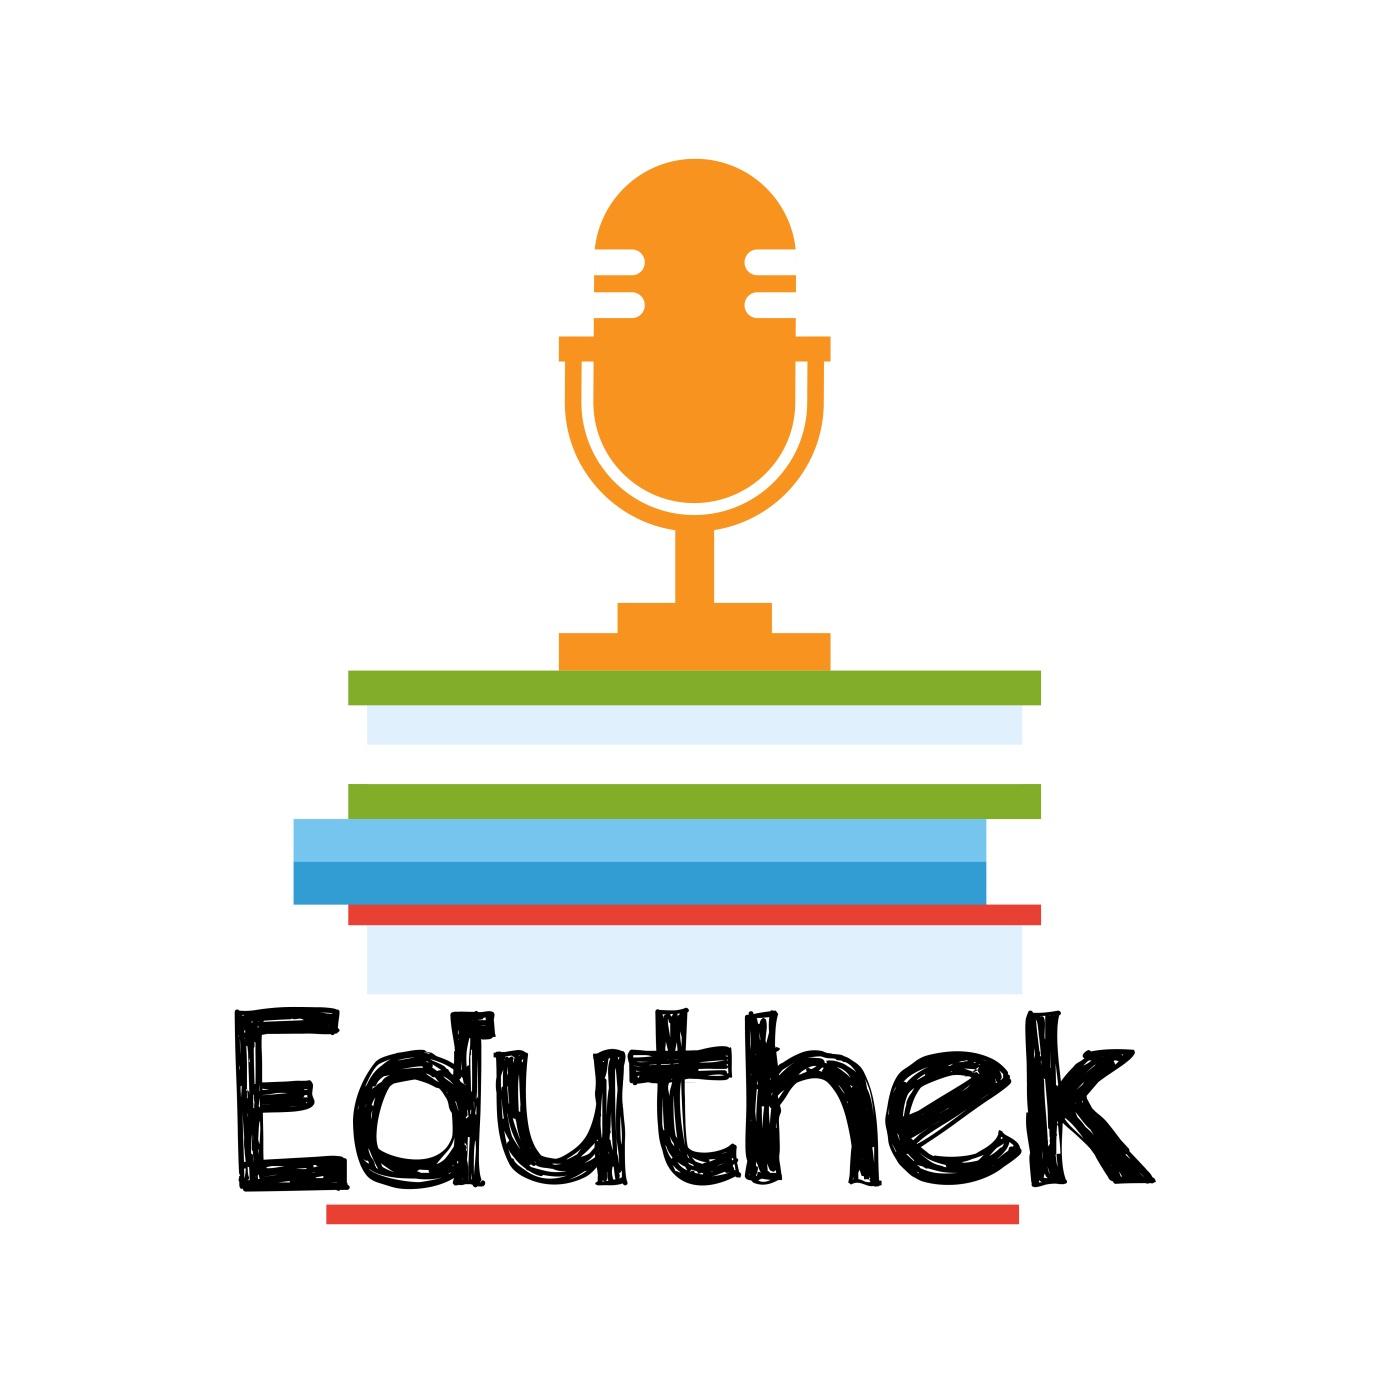 Eduthek 11 - Wahrnehmung der Medienpädagogik